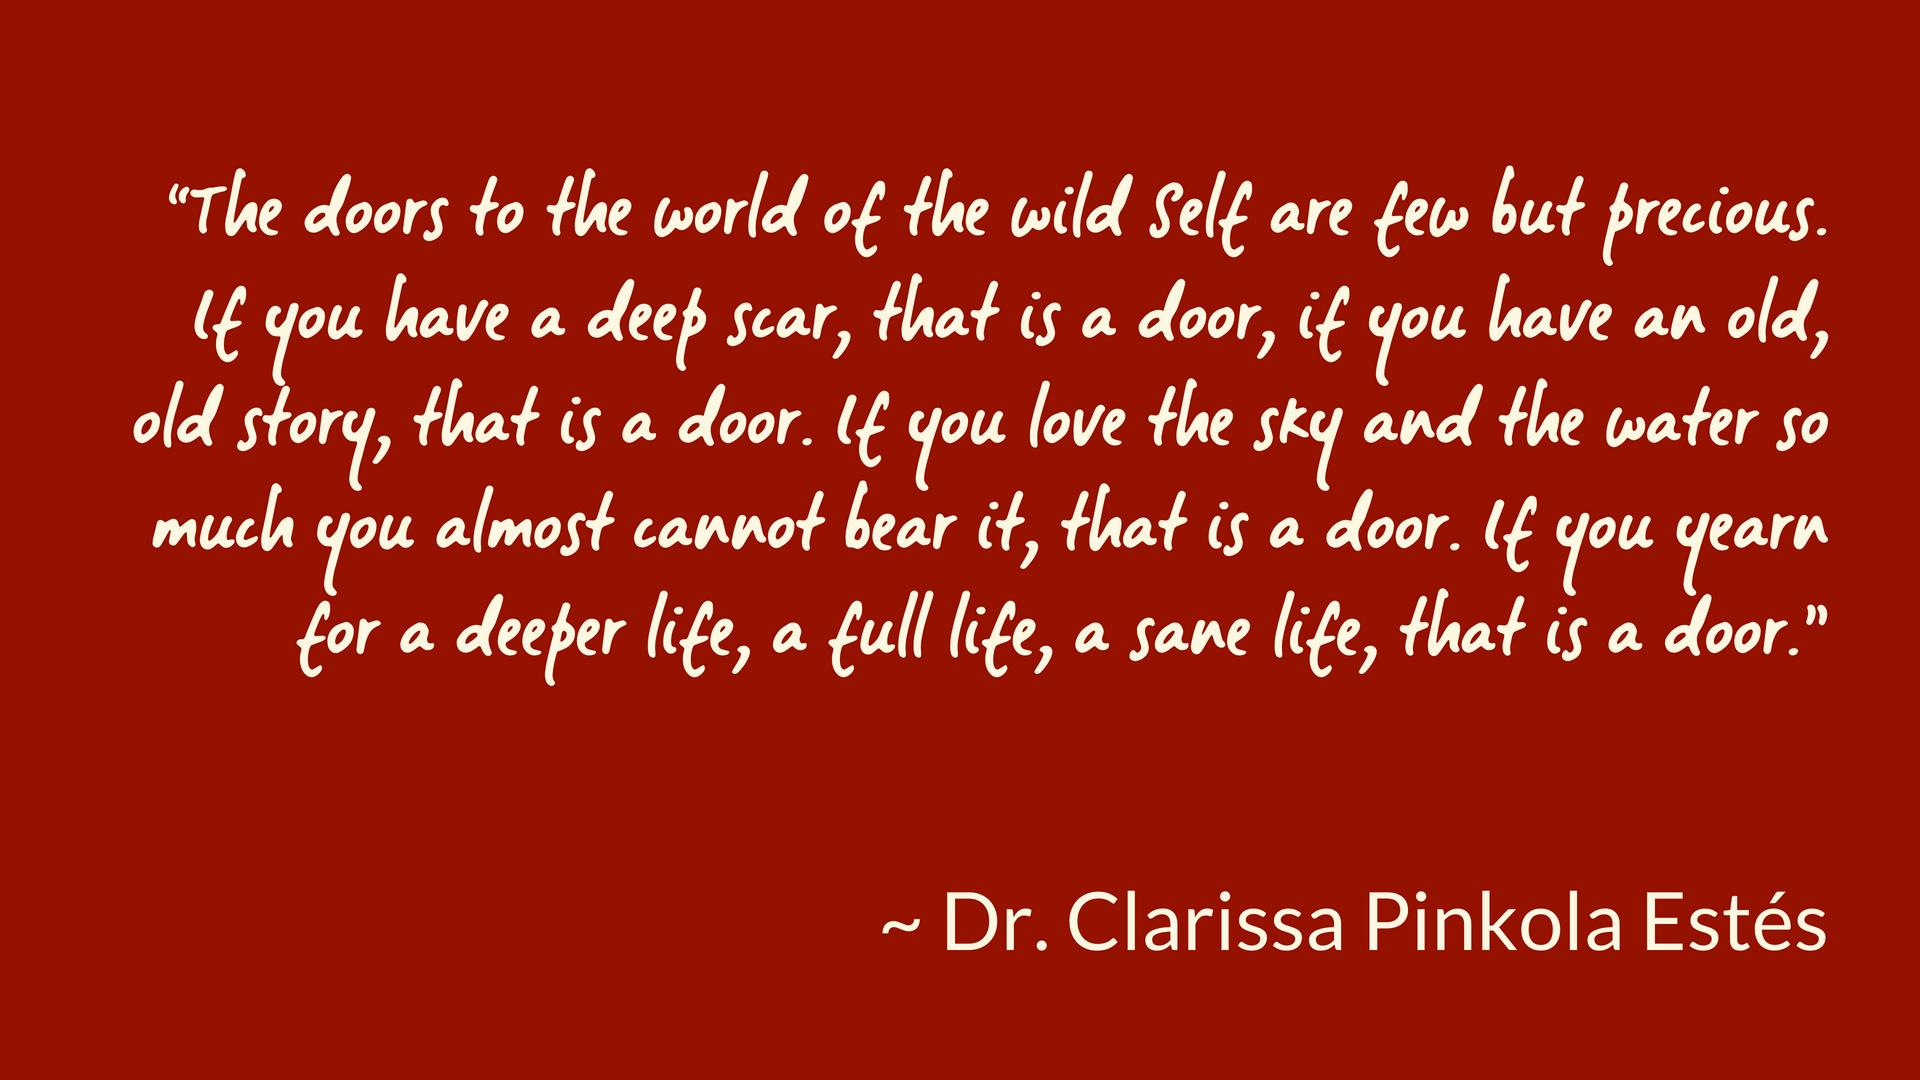 dr-clarissa-pinkola-estes-quotes.png